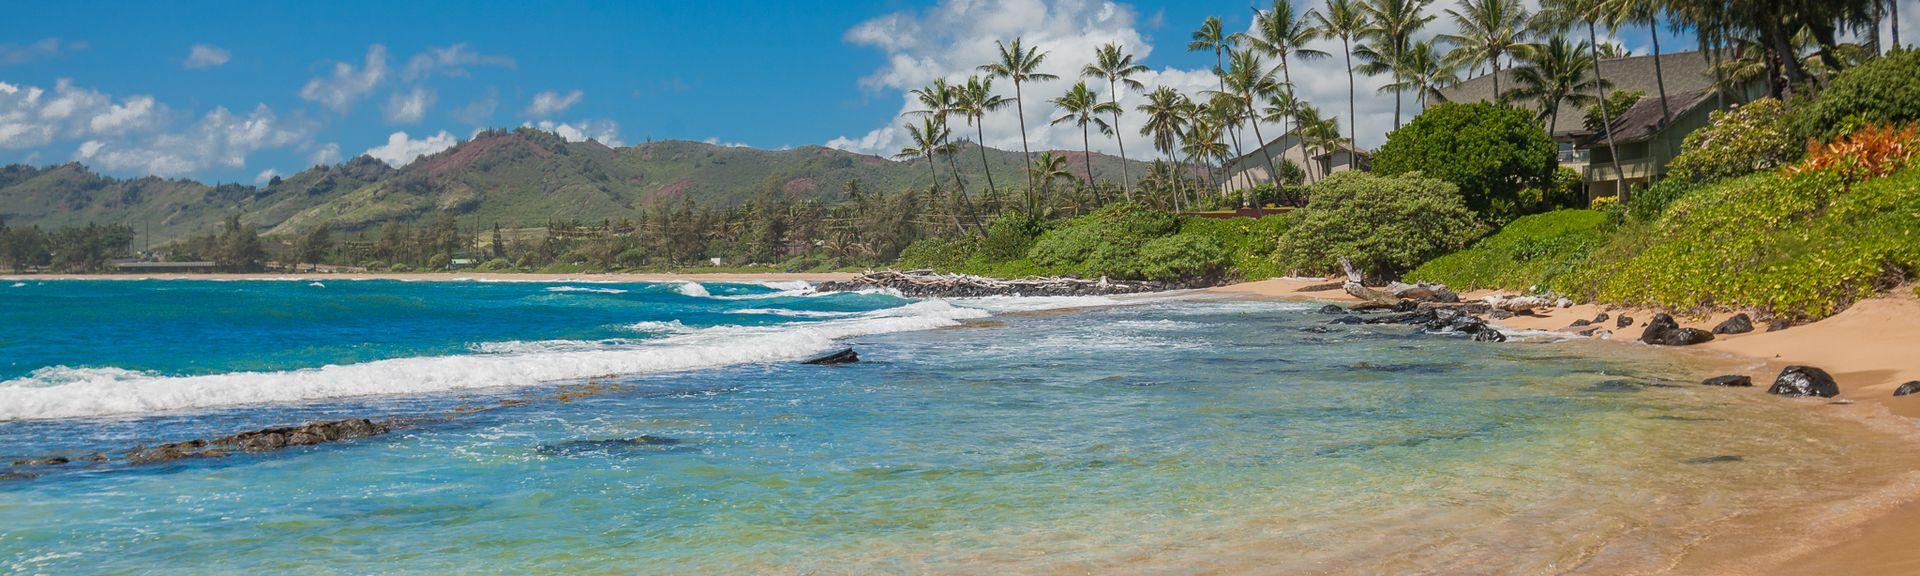 Kapaia, Hawaii, Stati Uniti d'America